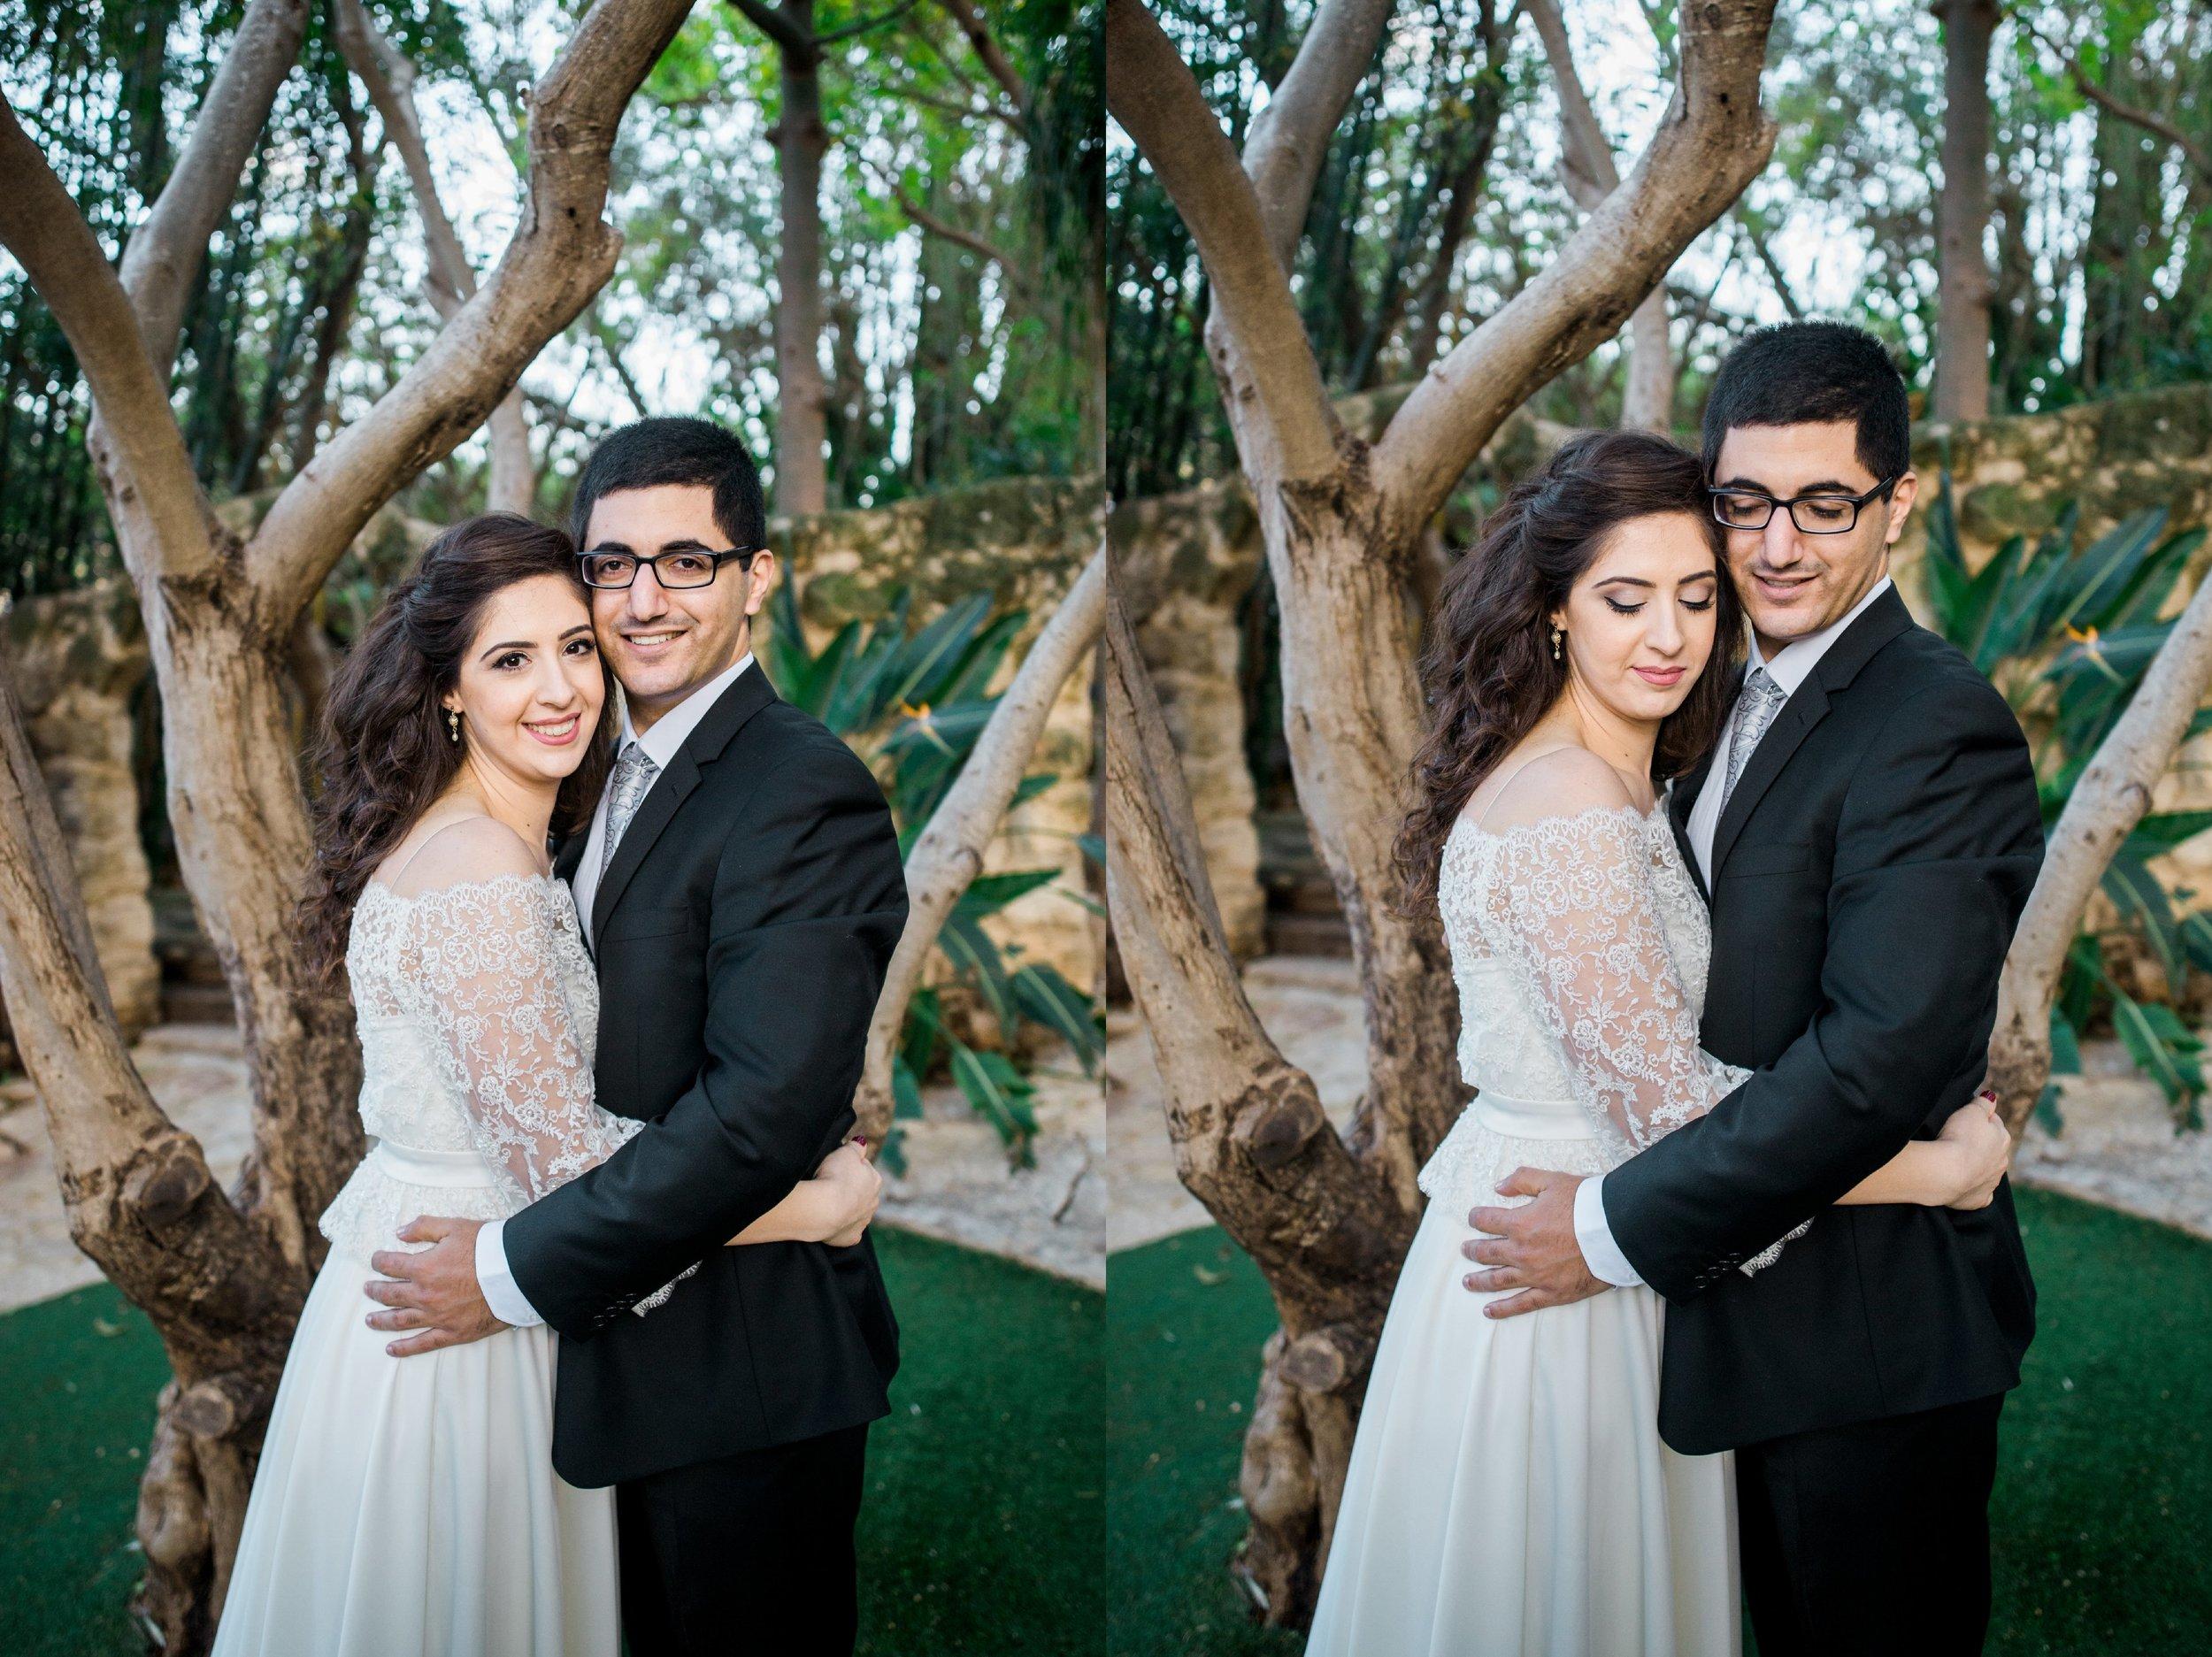 israel-garden-wedding-portraits-session-kate-giryes-photography--59_WEB.jpg